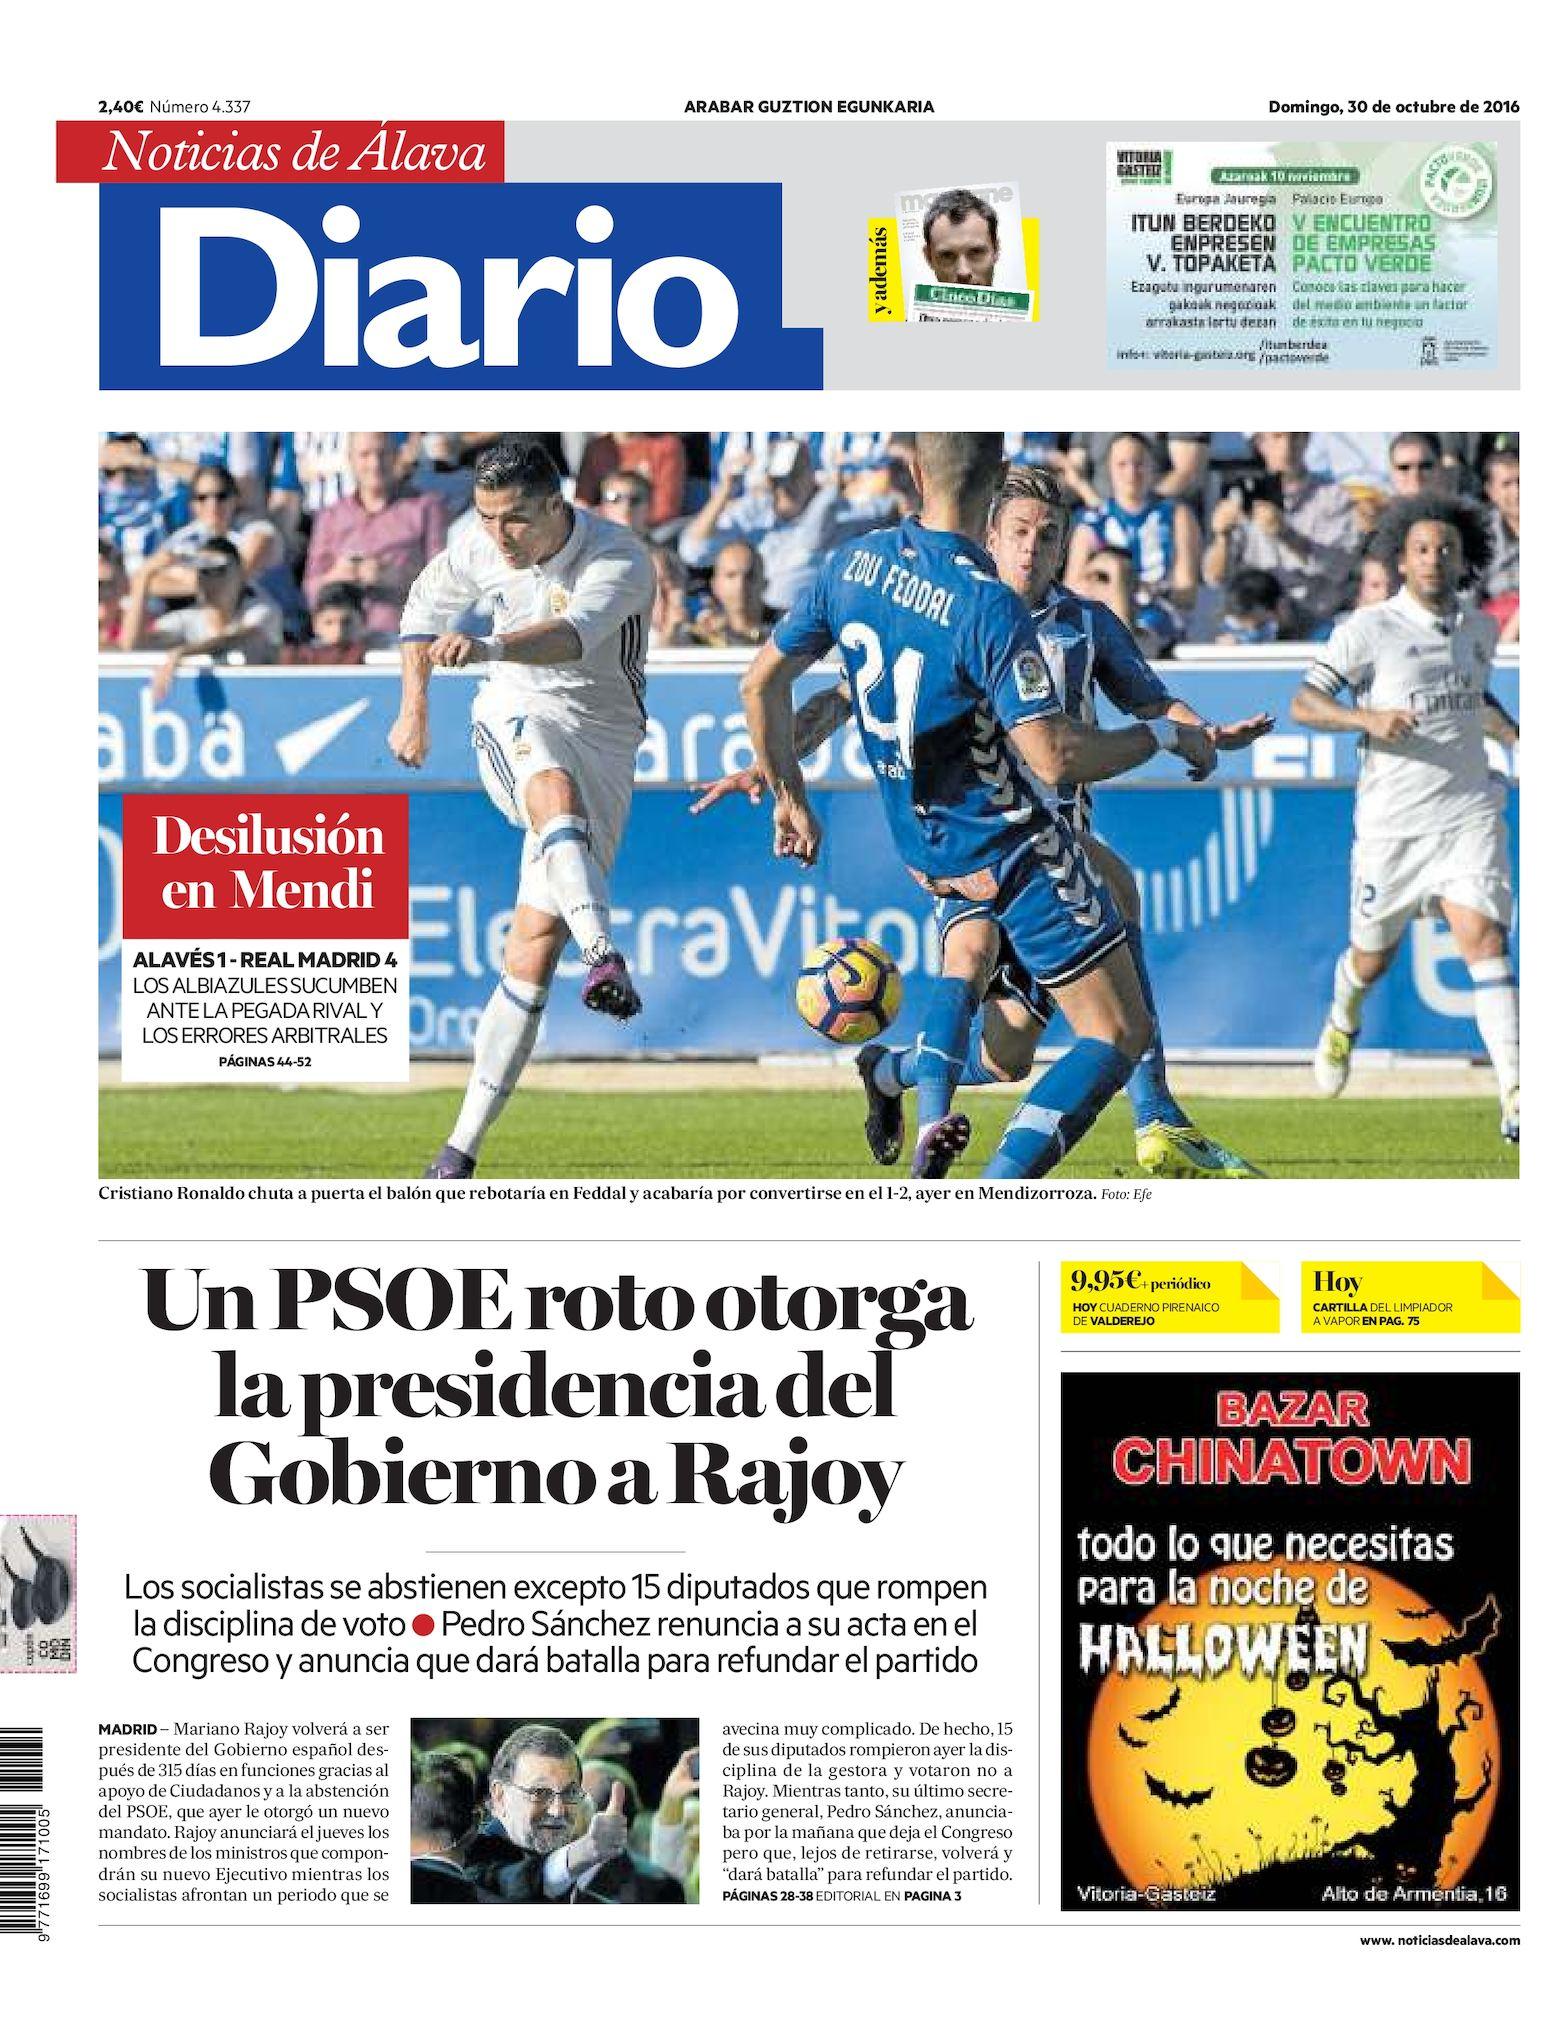 Calaméo - Diario de Noticias de Álava 20161030 2c1f663c3f0f3